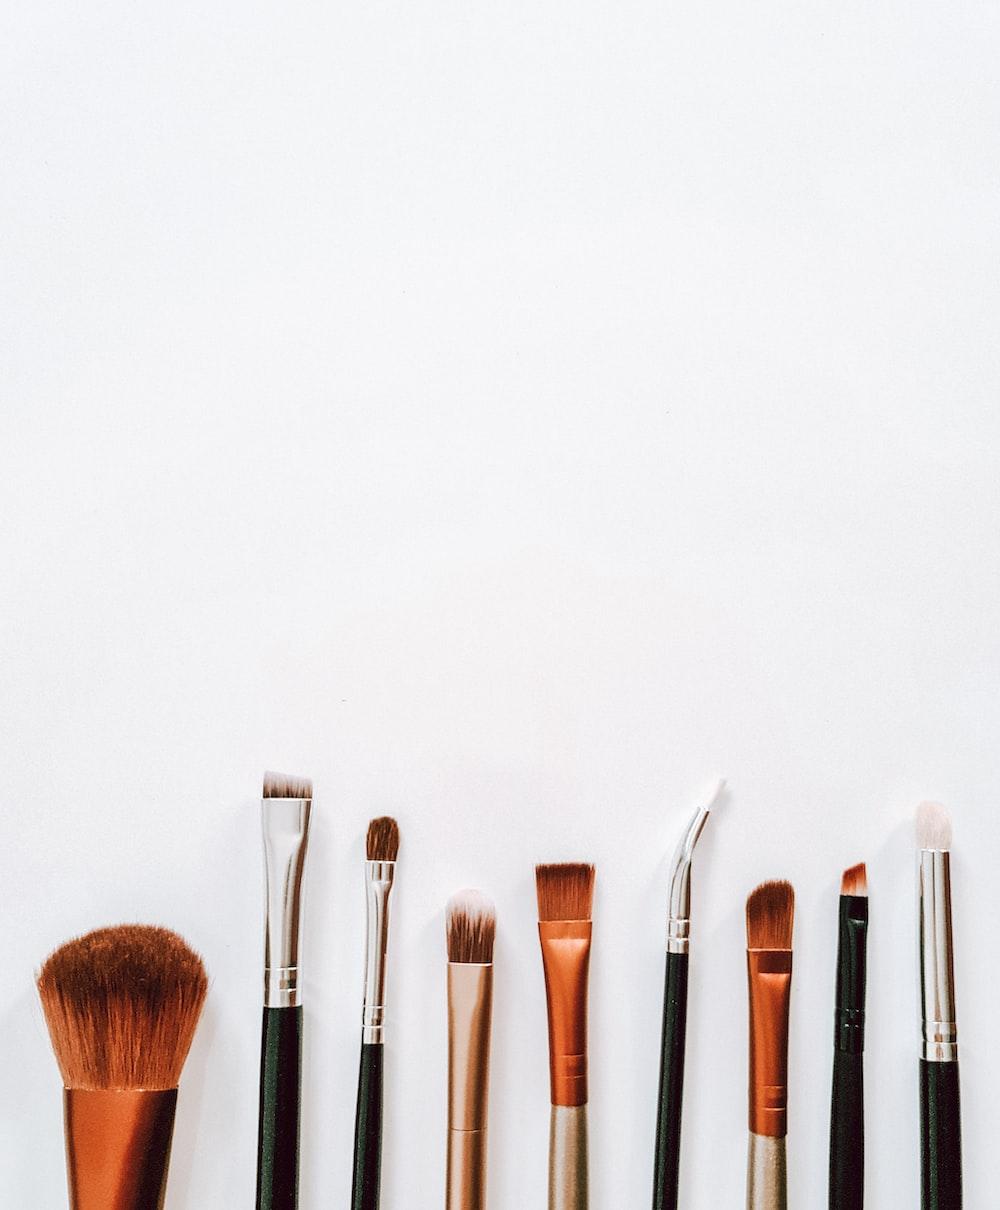 brown and silver makeup brush set